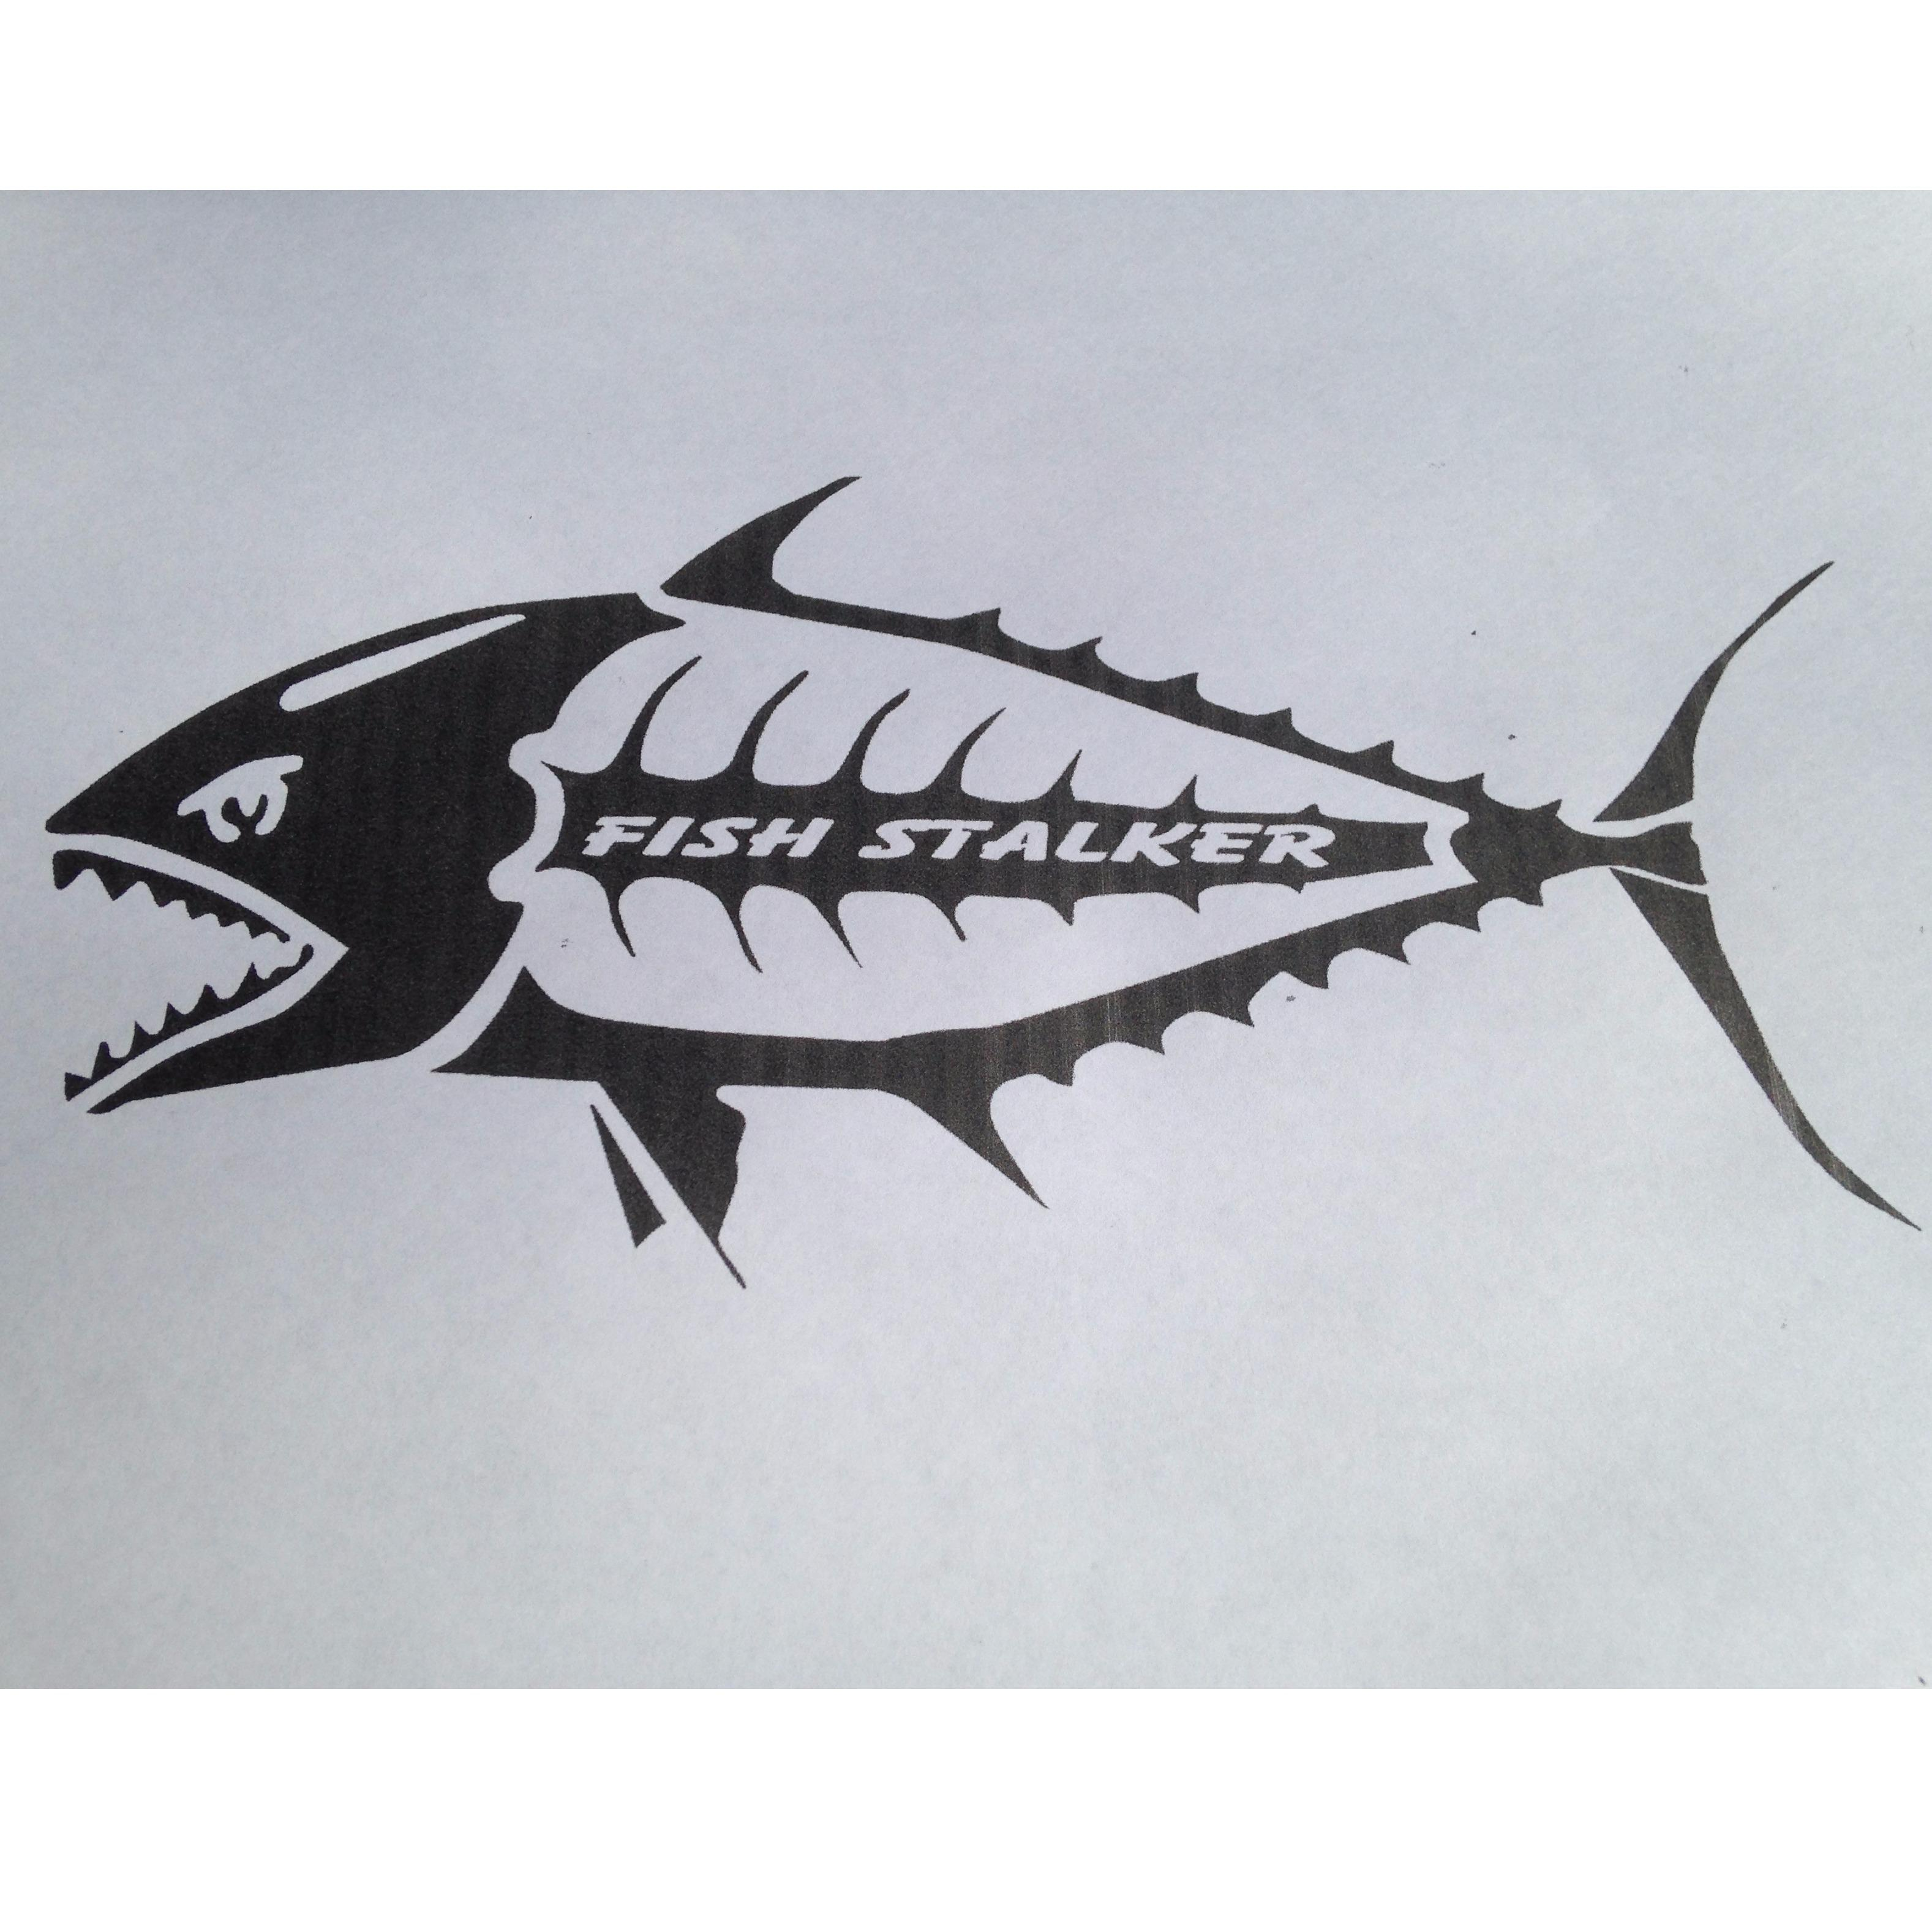 Fish Stalker Charters